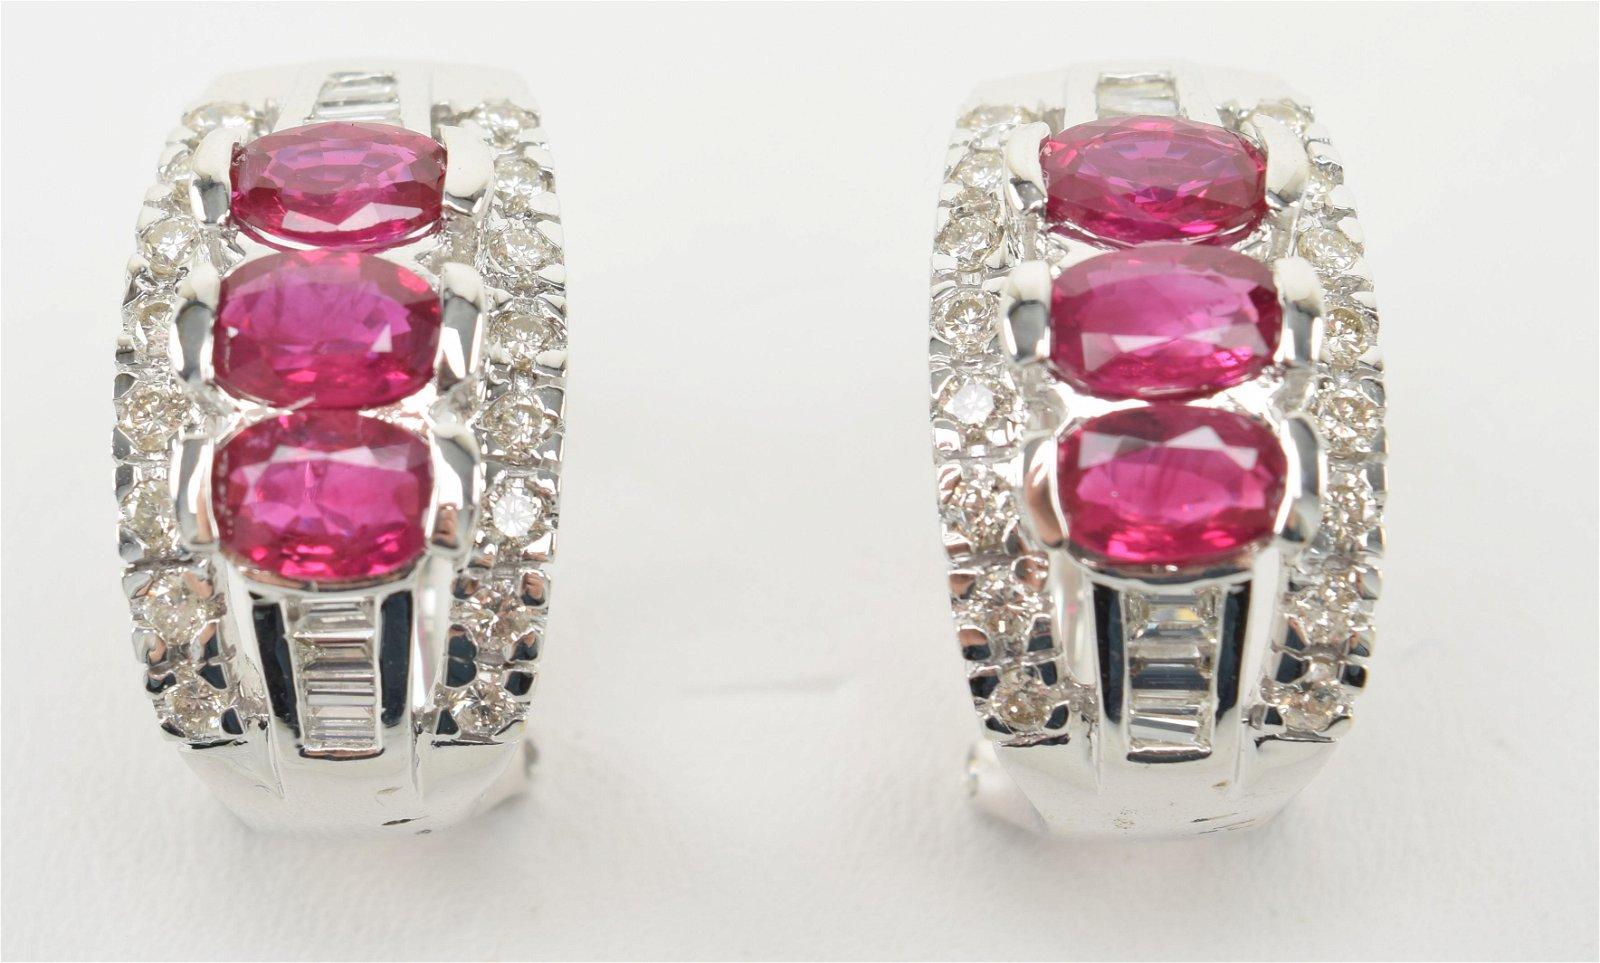 18K White Gold, Diamond and Ruby Huggie Earrings